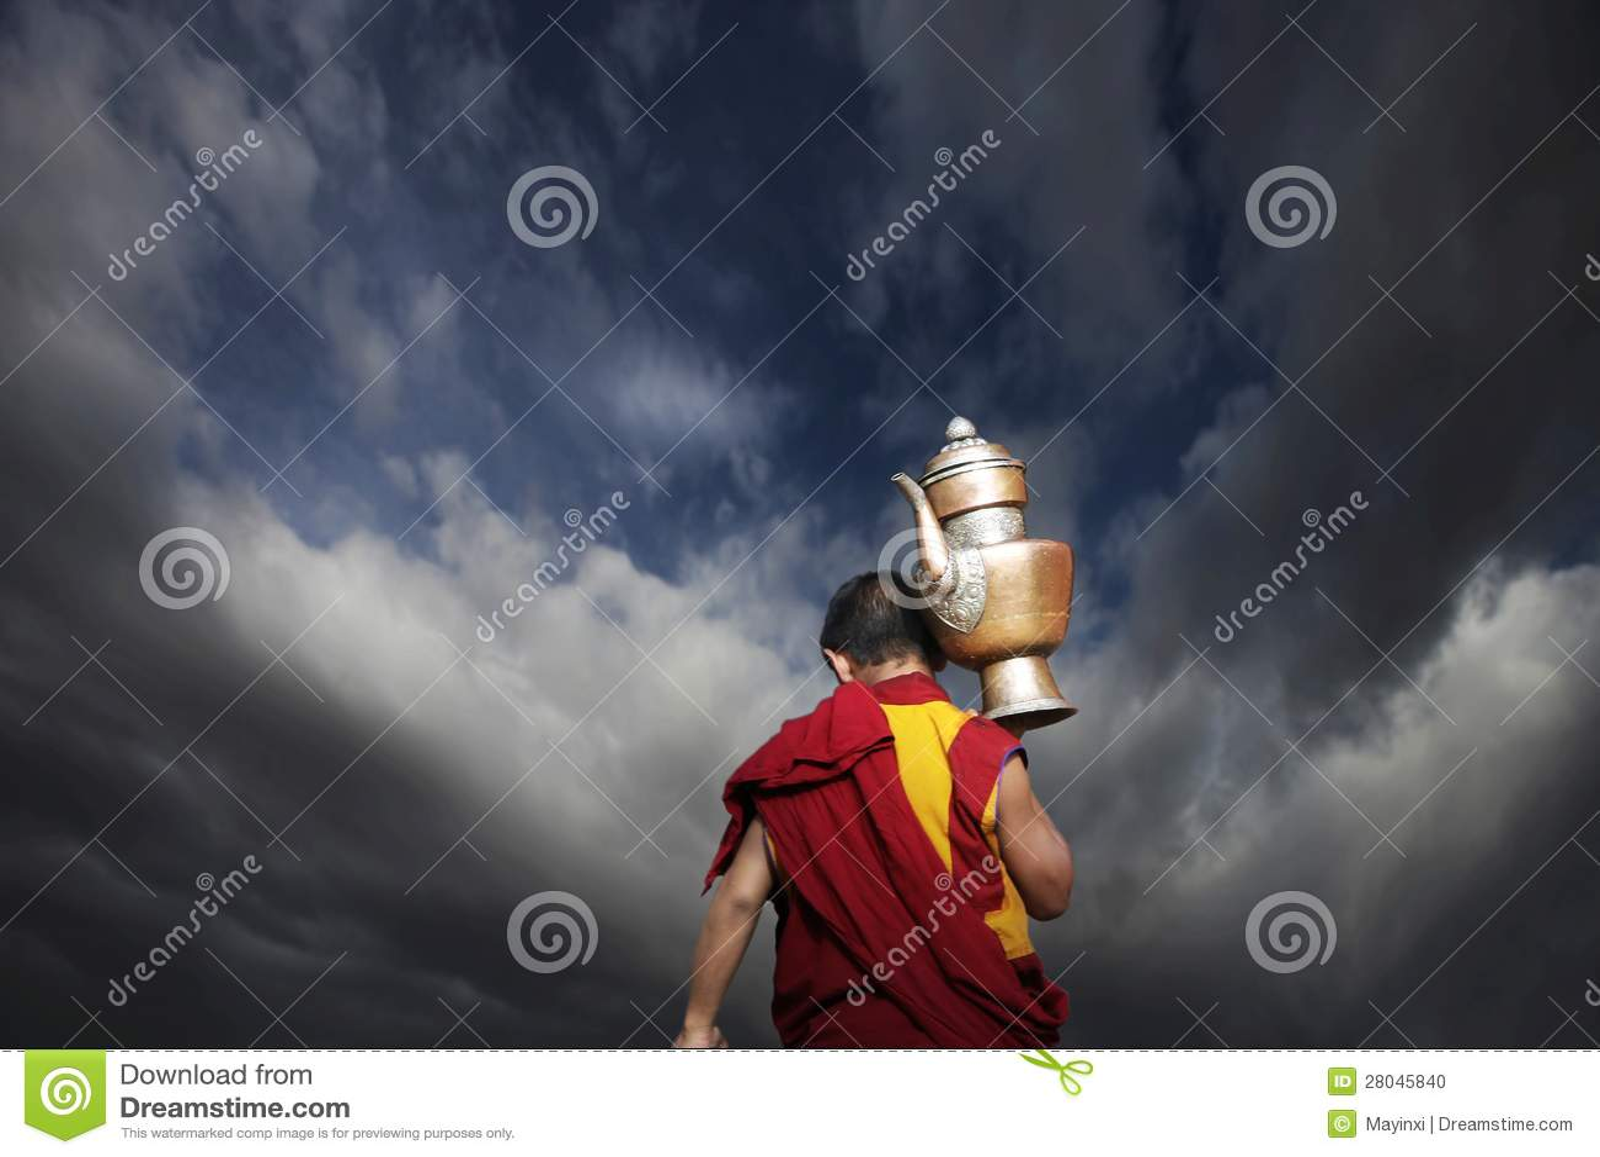 buddhism man and nature relationship